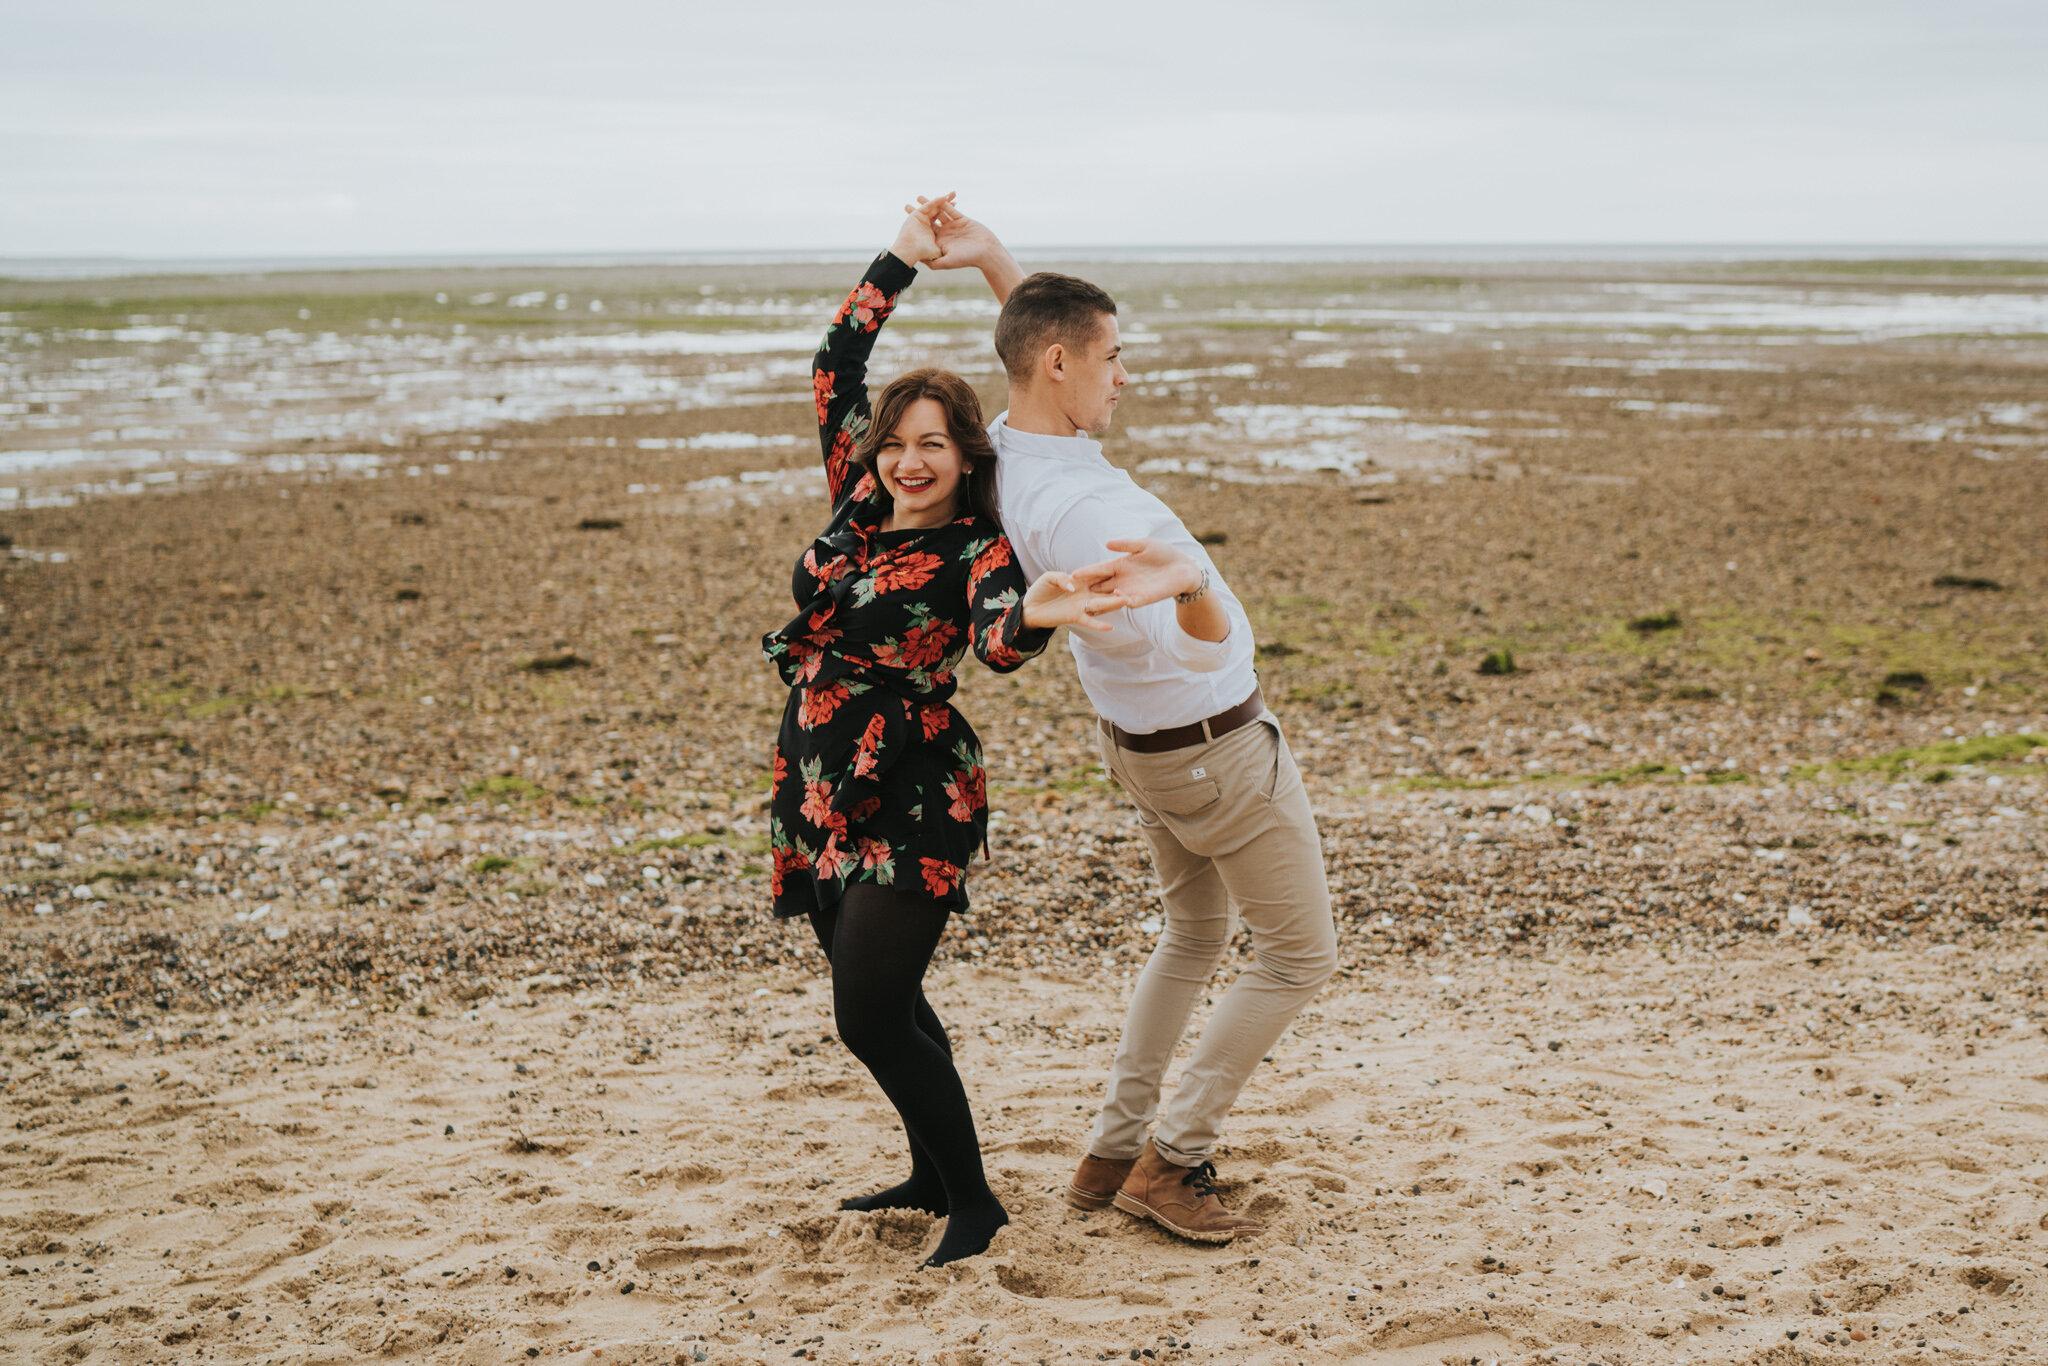 engagement-pre-wedding-hannah-michael-cudmore-grove-east-mersea-grace-elizabeth-colchester-essex-devon-suffolk-and-norfolk-alternative-wedding-and-family-photographer (46 of 51).jpg